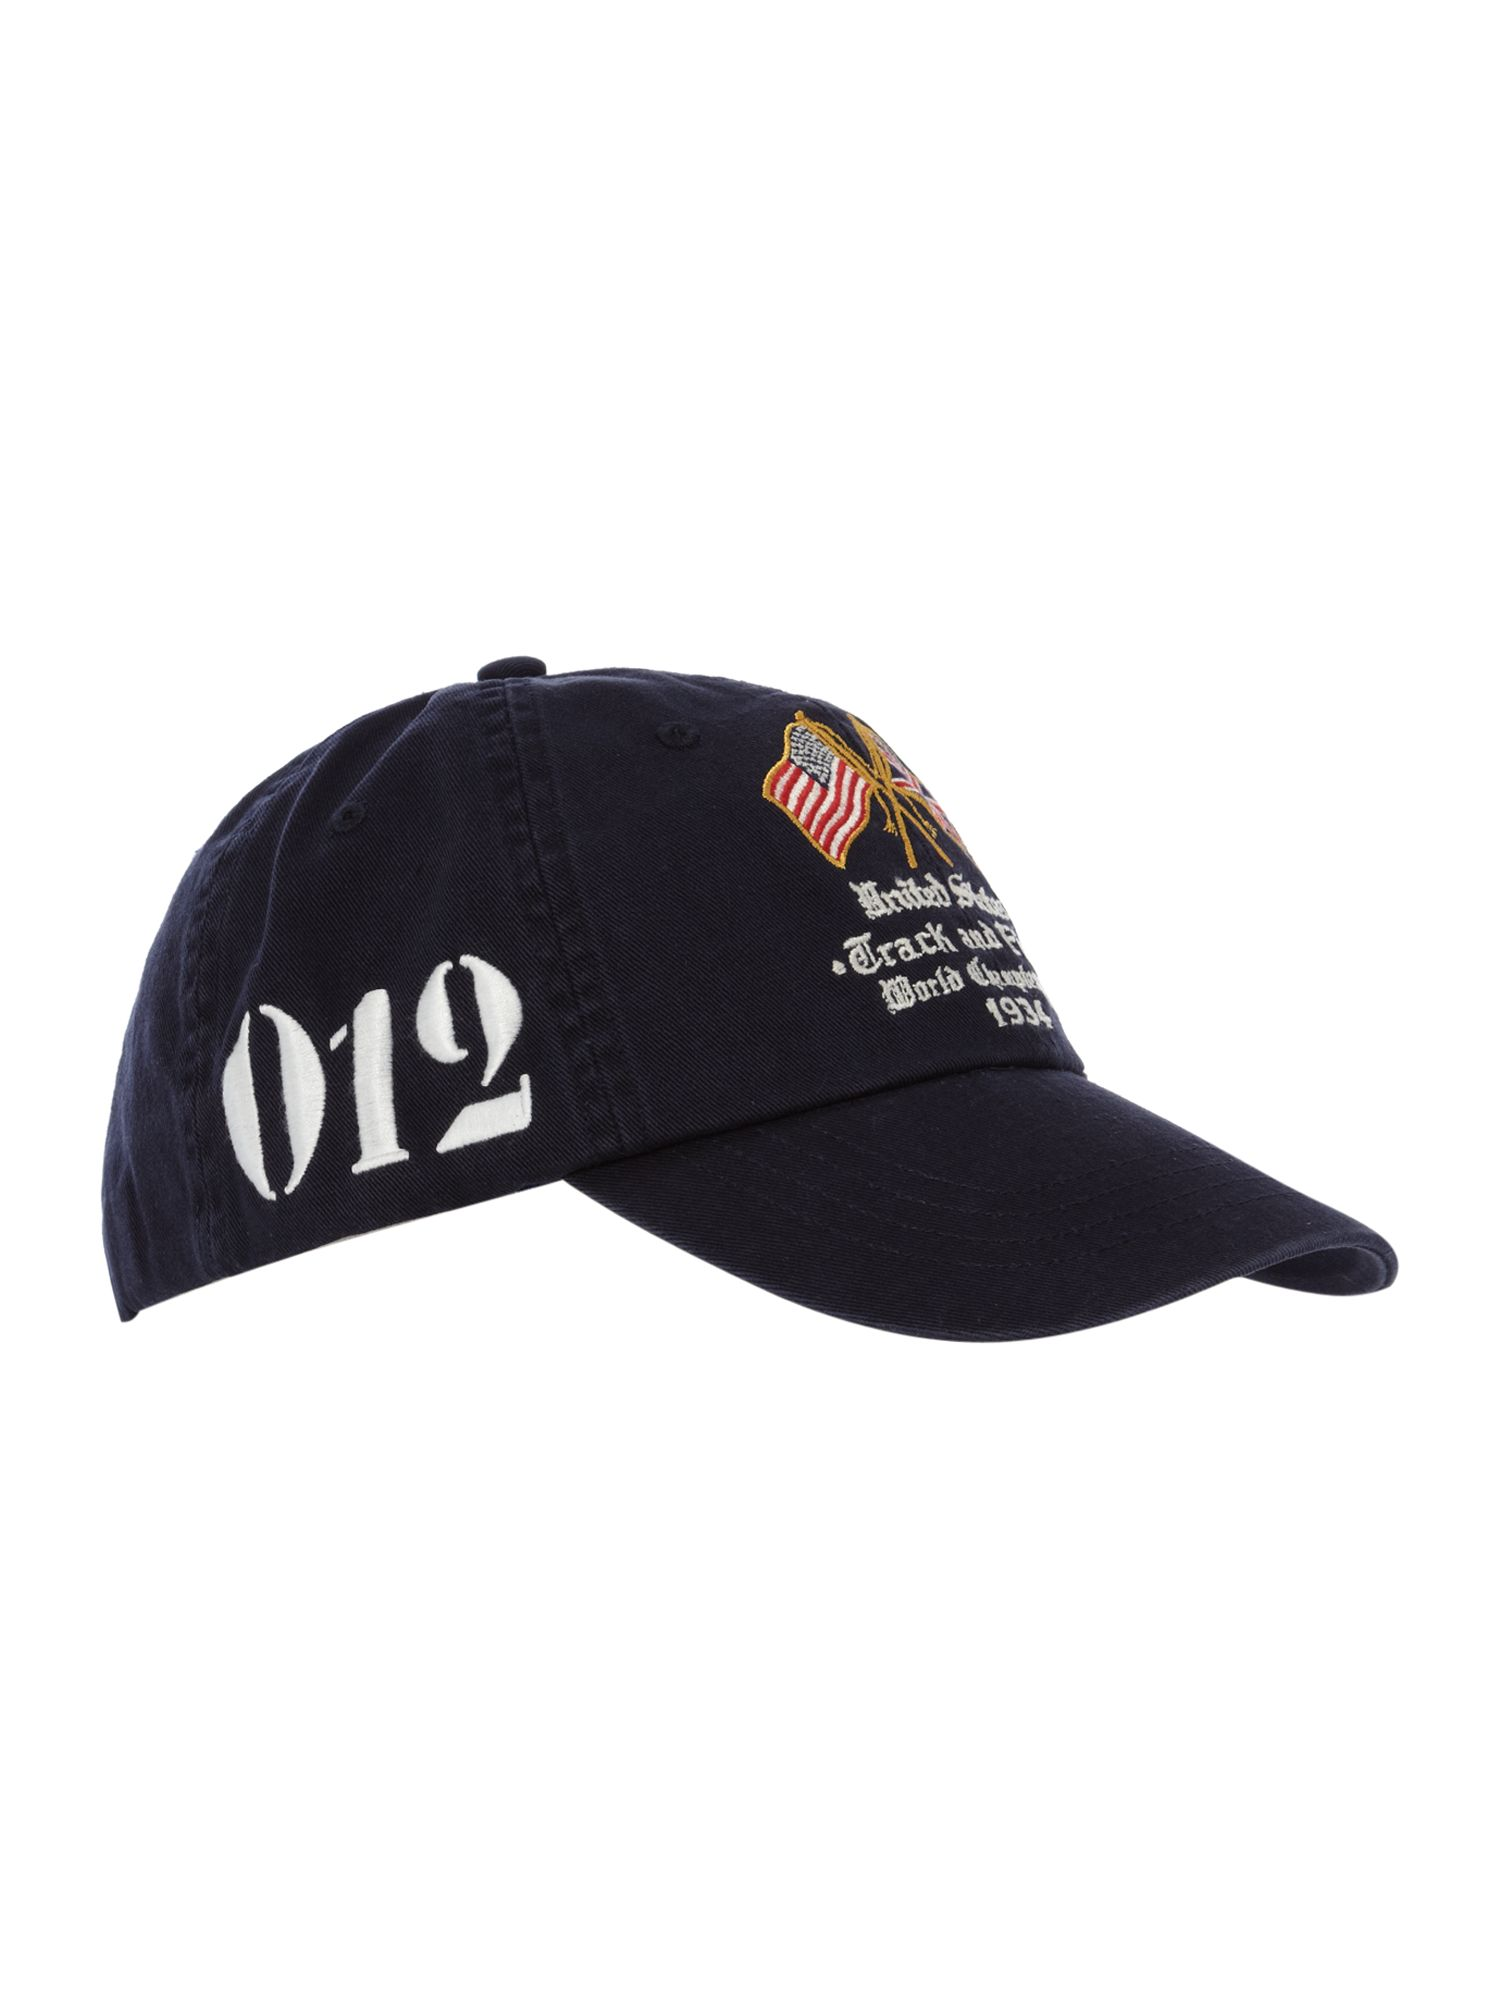 polo ralph lauren country baseball cap in black for men lyst. Black Bedroom Furniture Sets. Home Design Ideas